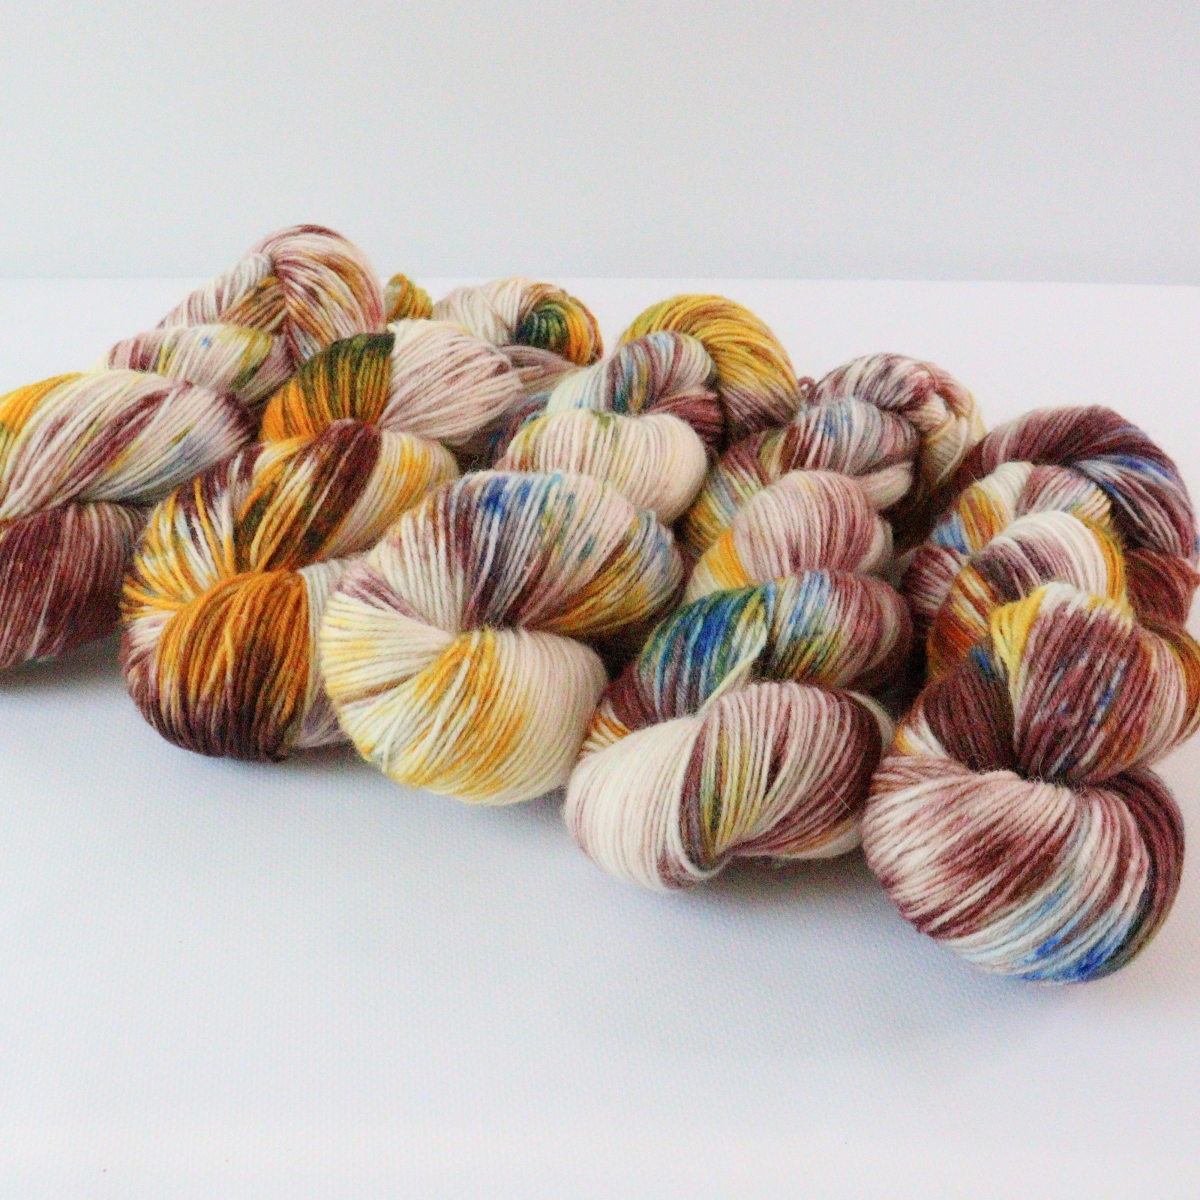 woodico.pro hand dyed yarn 089 4 1200x1200 - Hand dyed yarn / 089